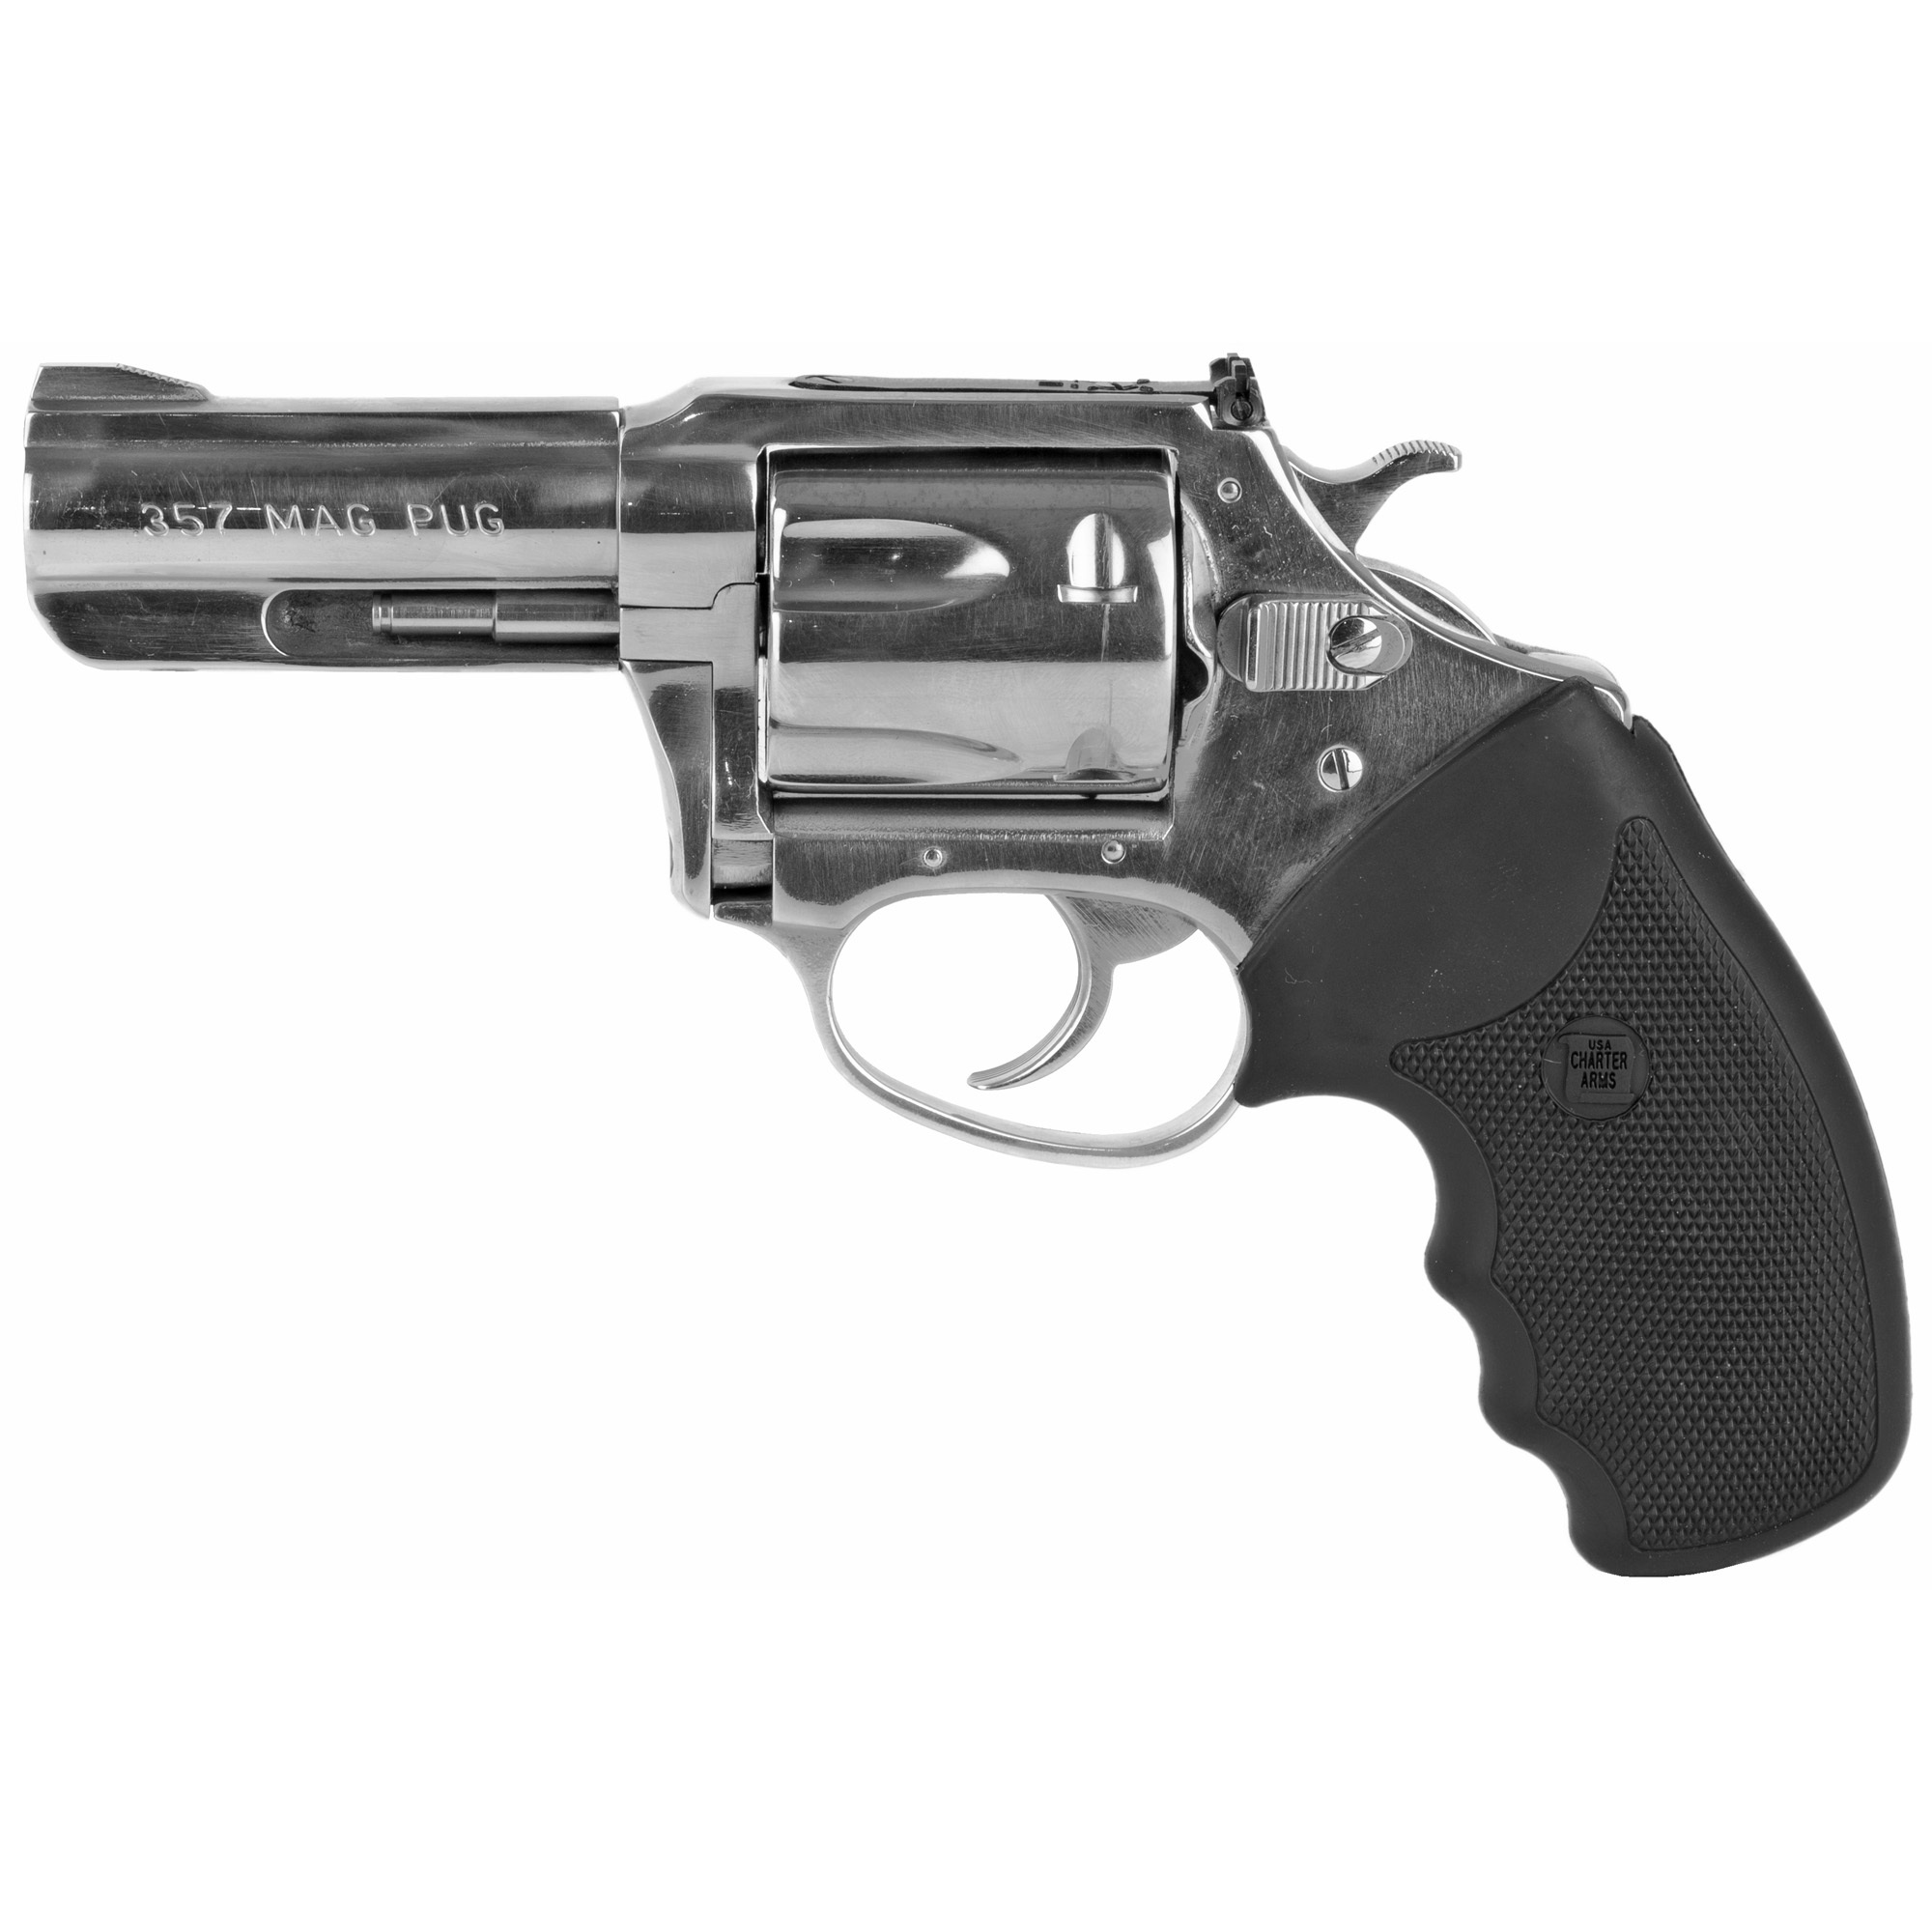 "Charter Arms Mag Pug 357mag 3"" Hp"